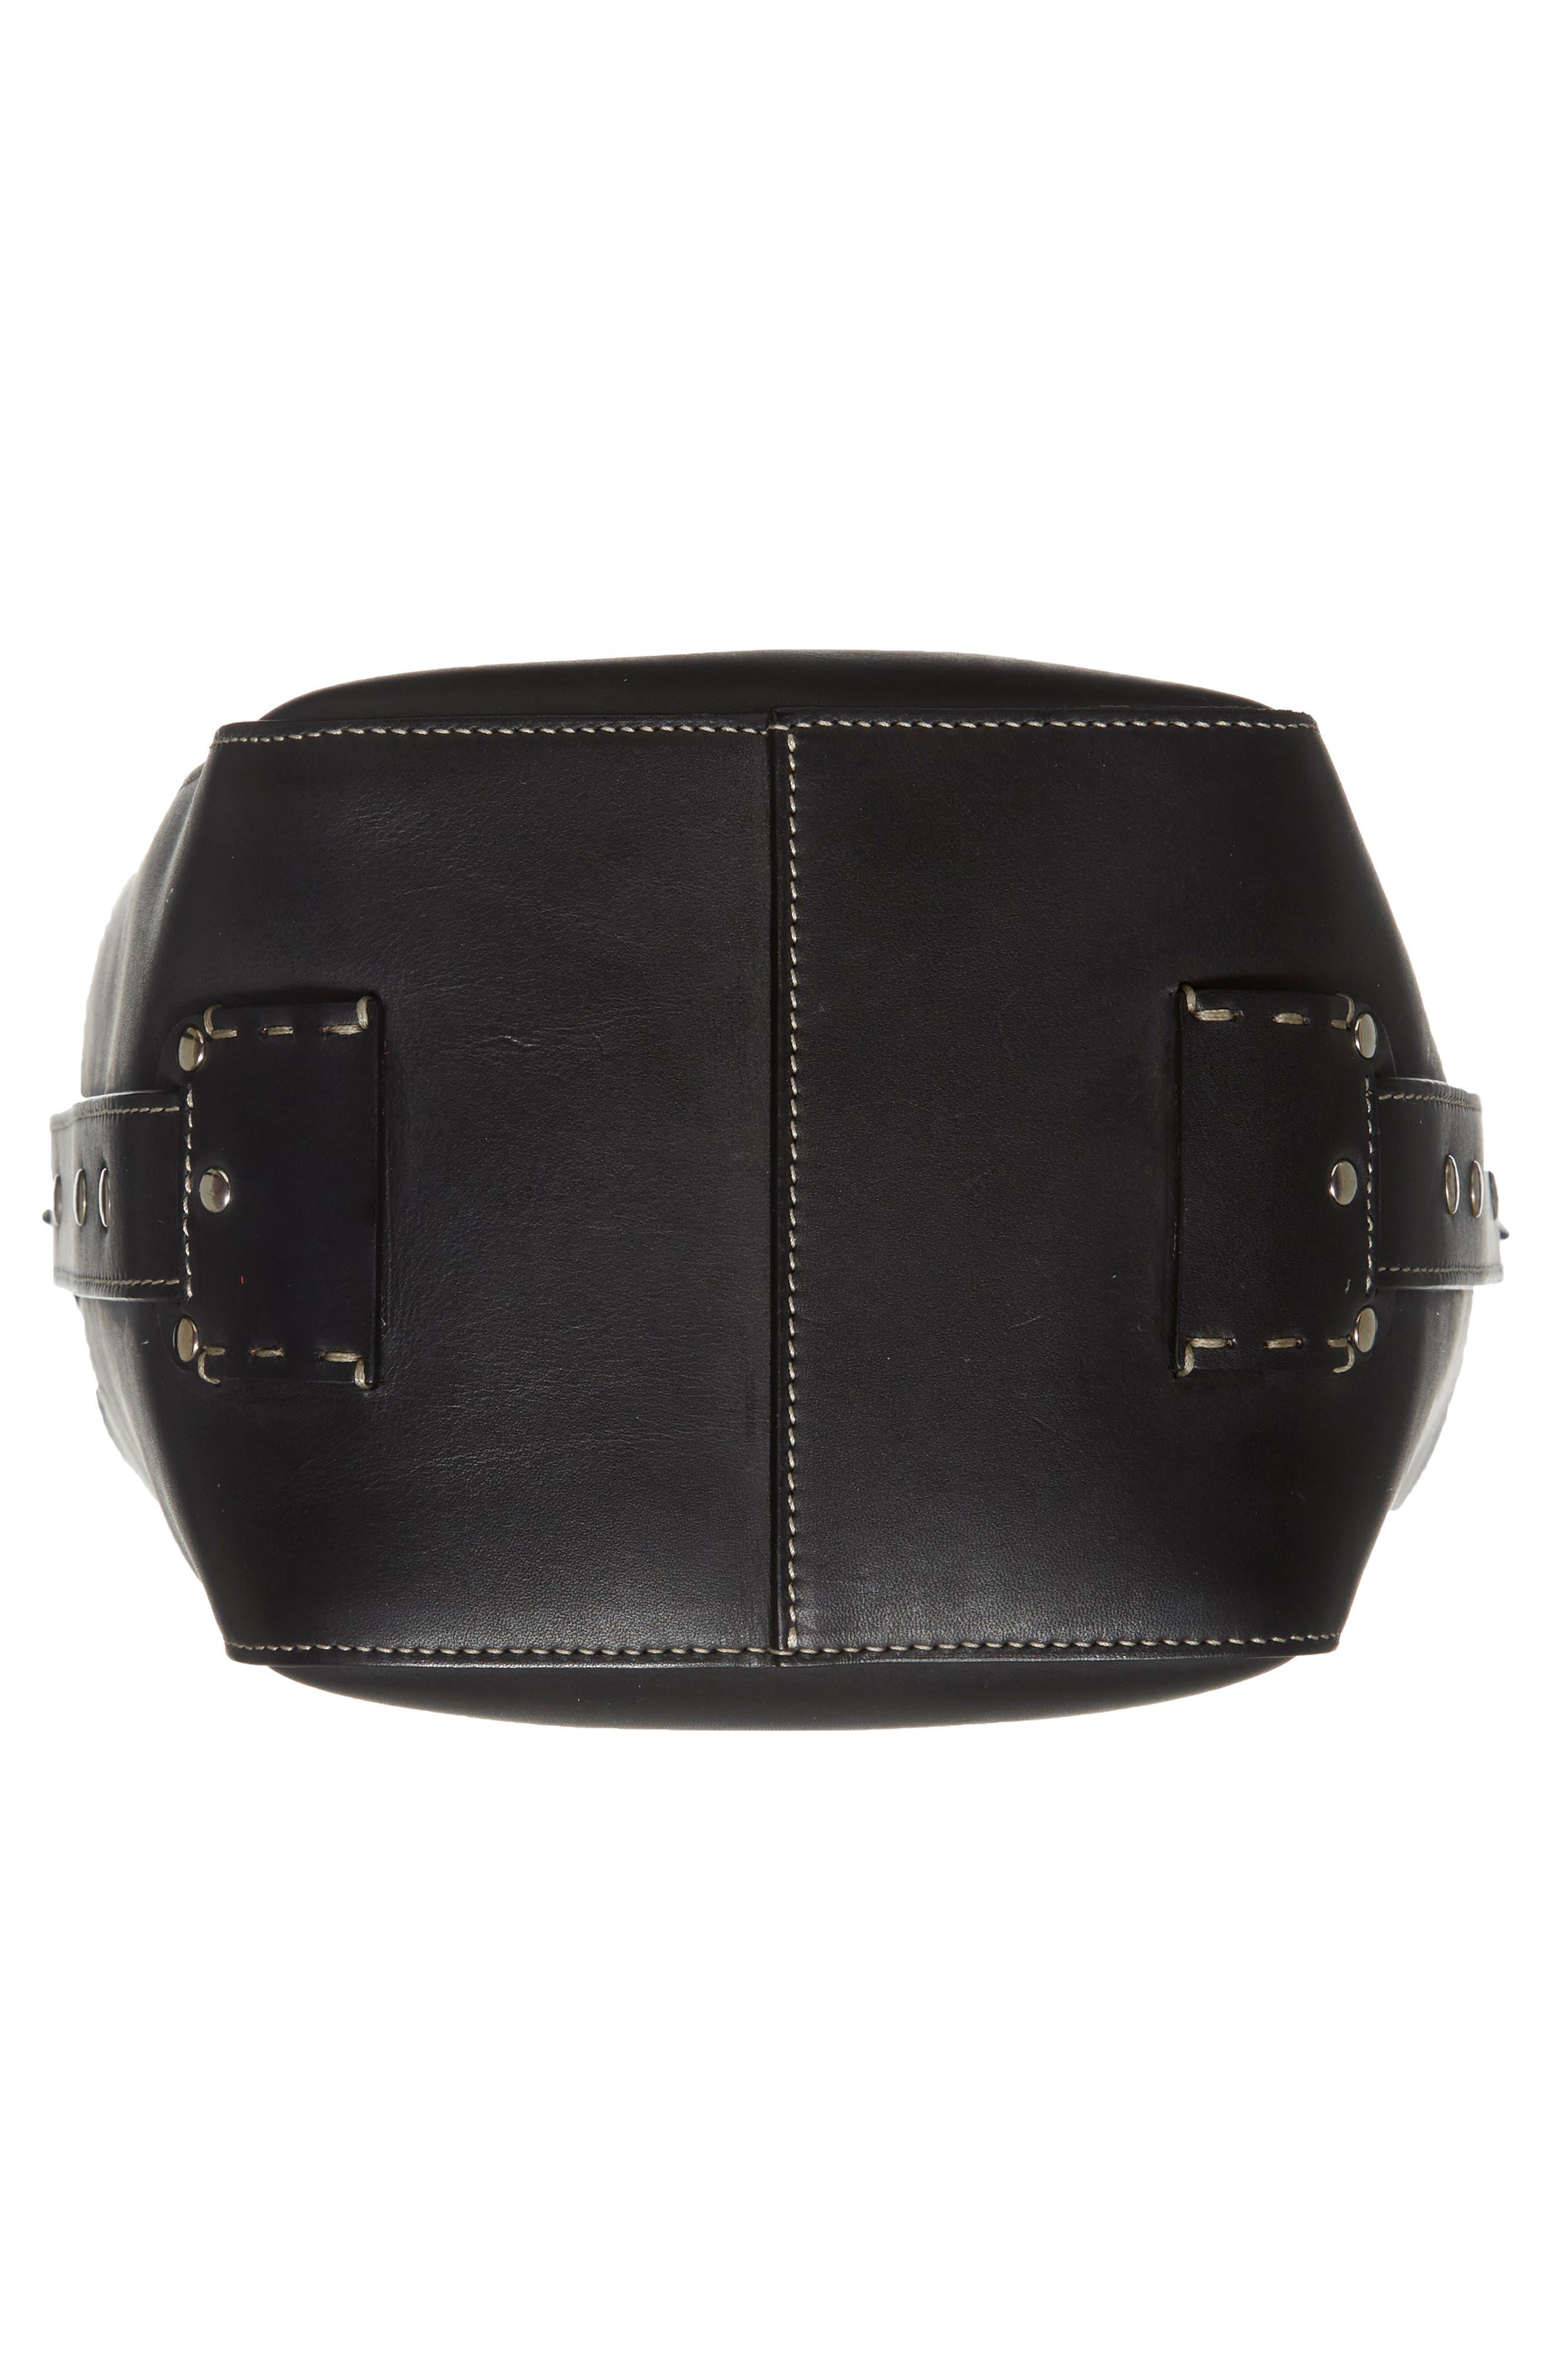 Starlet Leather Bucket Bag,                             Alternate thumbnail 6, color,                             BLACK